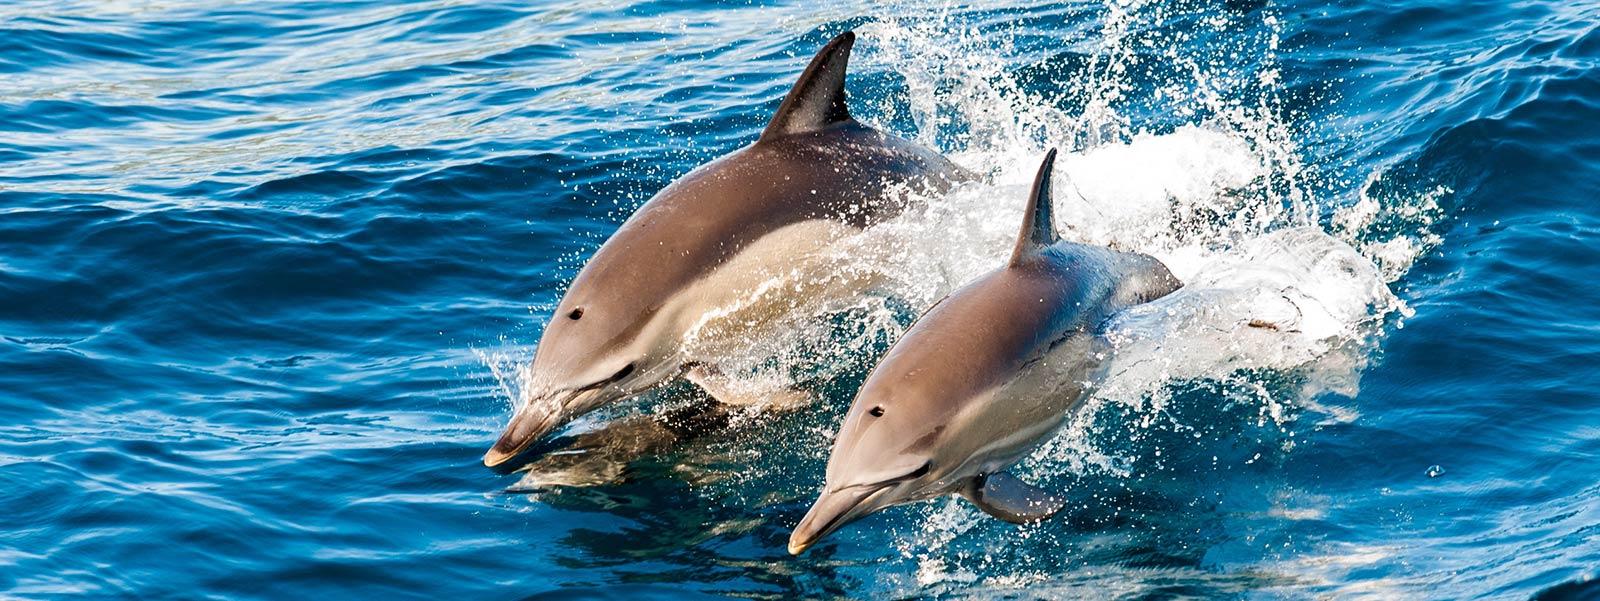 hurawalhi-maldives-dolphins-1600x600